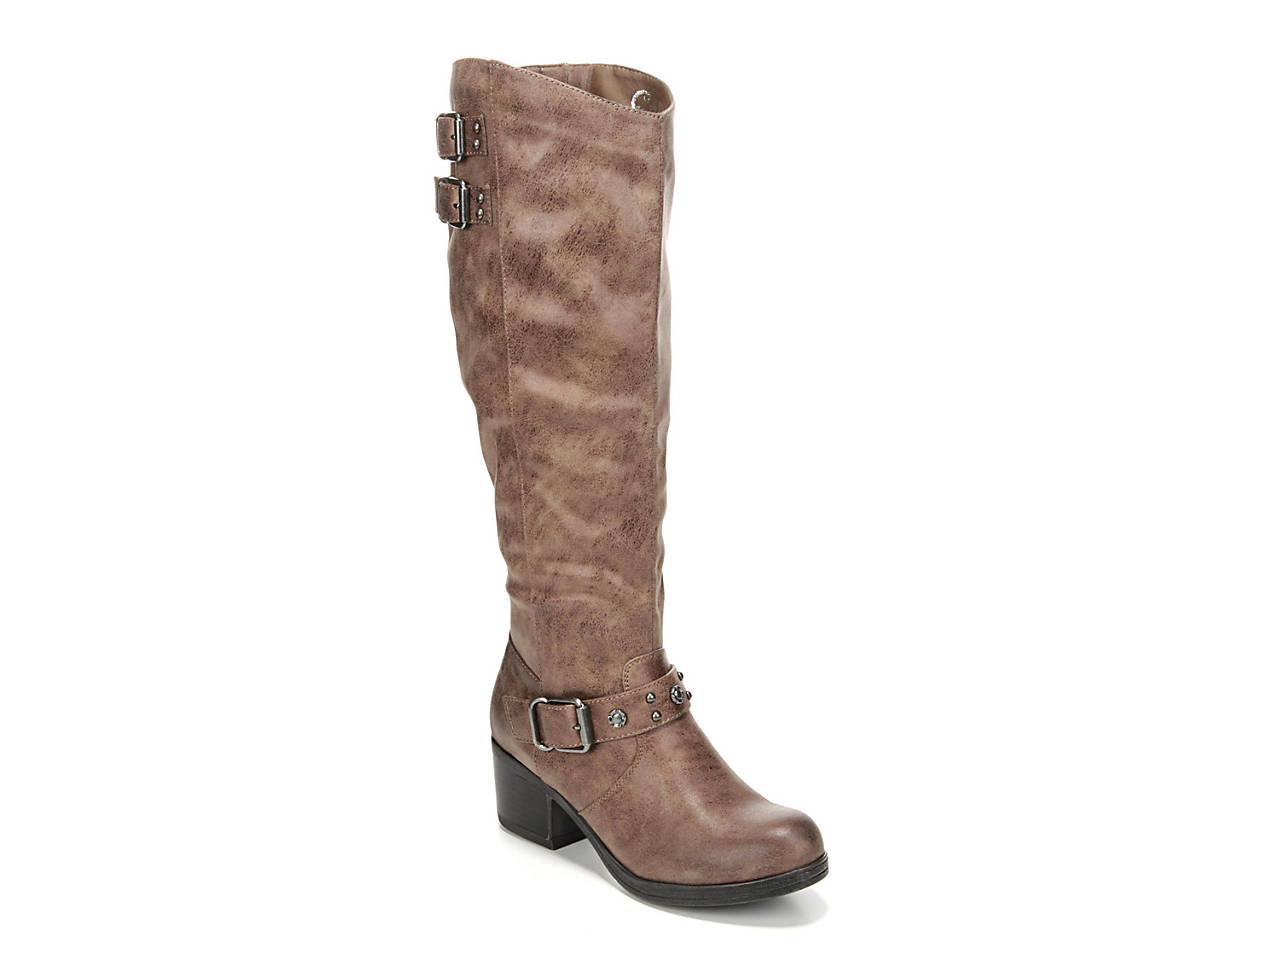 55c38892680 Carlos by Carlos Santana Cara Wide Calf Riding Boot Women s Shoes